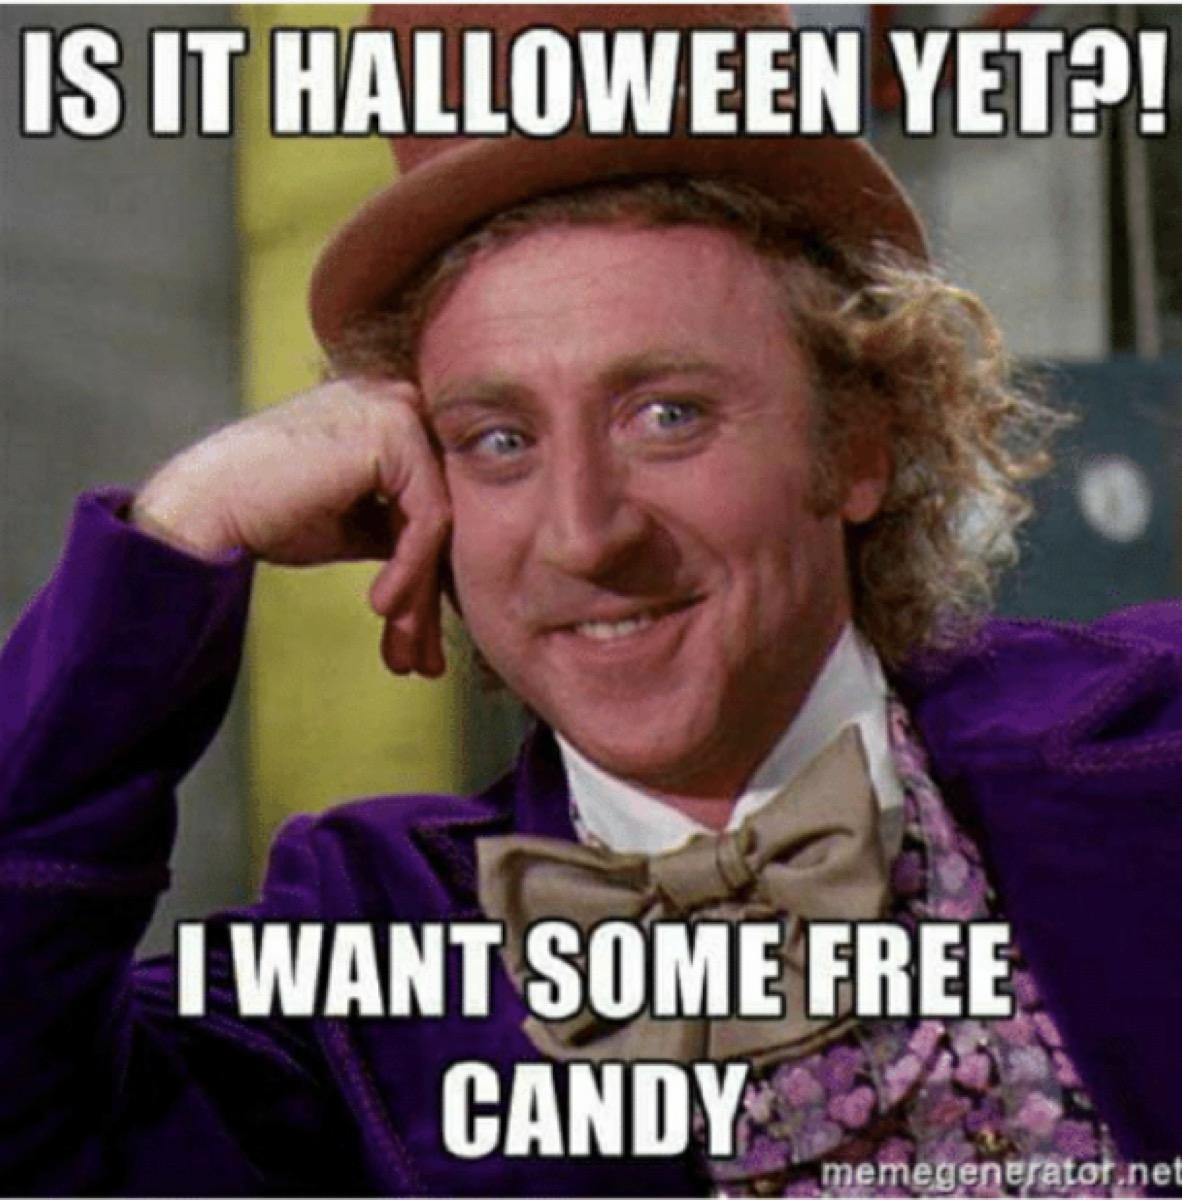 funny halloween meme free candy